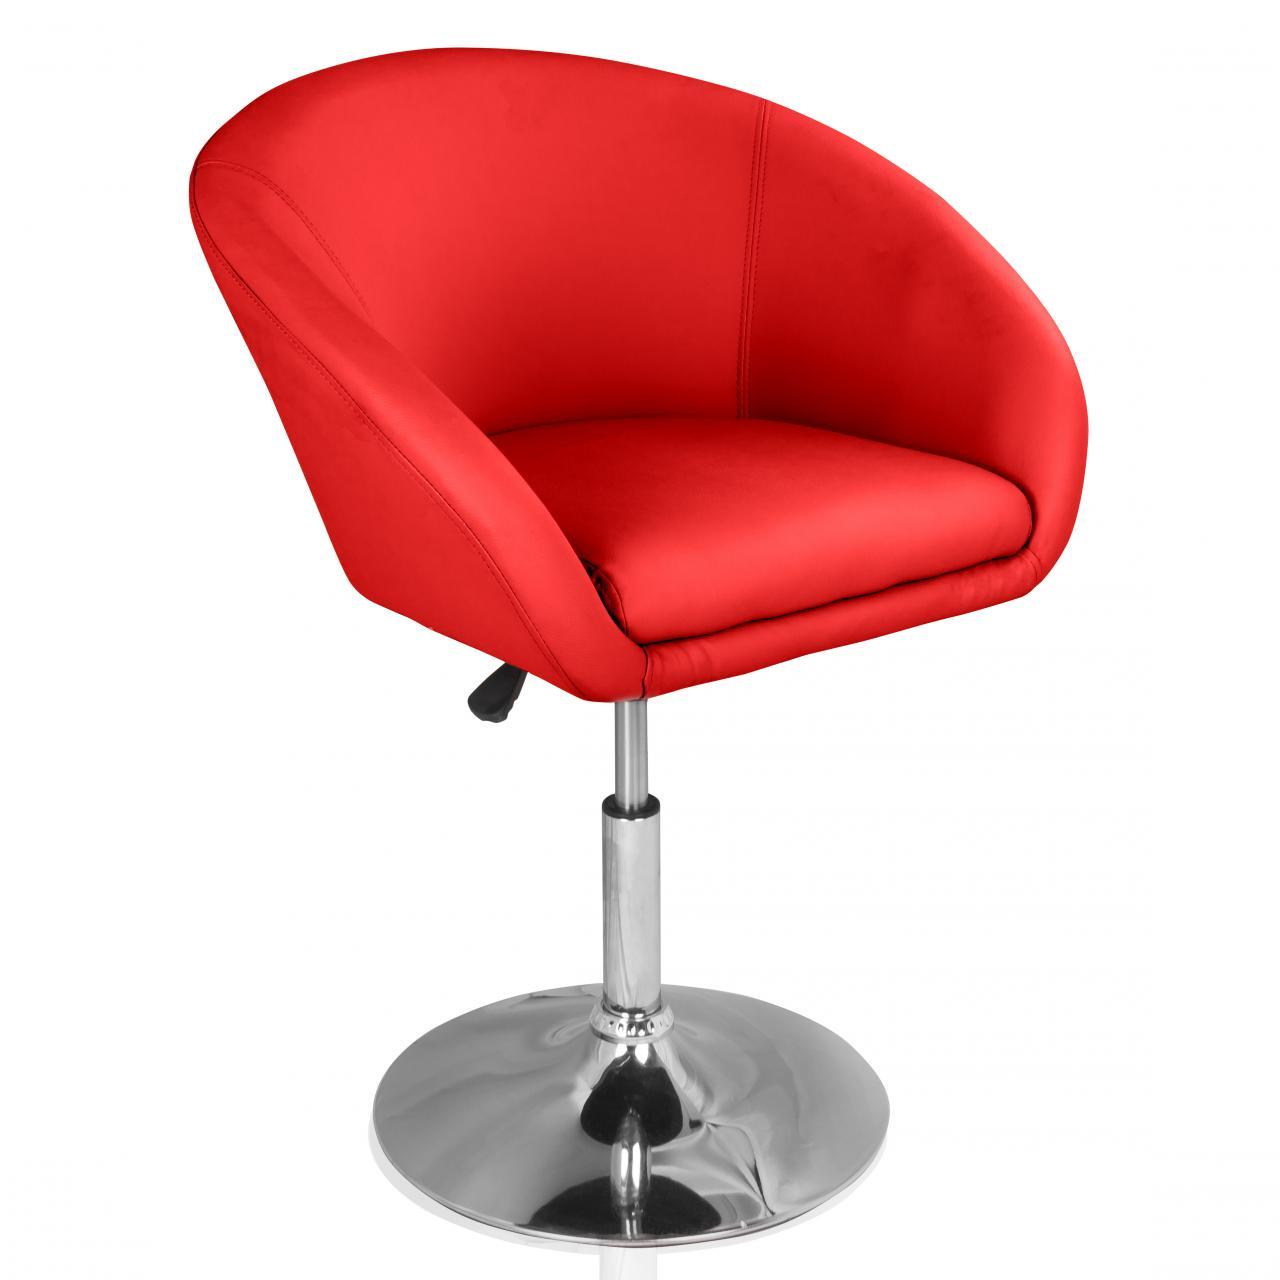 Loungesessel-Clubsessel-Barhocker-Drehstuhl-Cocktailsessel-Drehsessel-Sessel